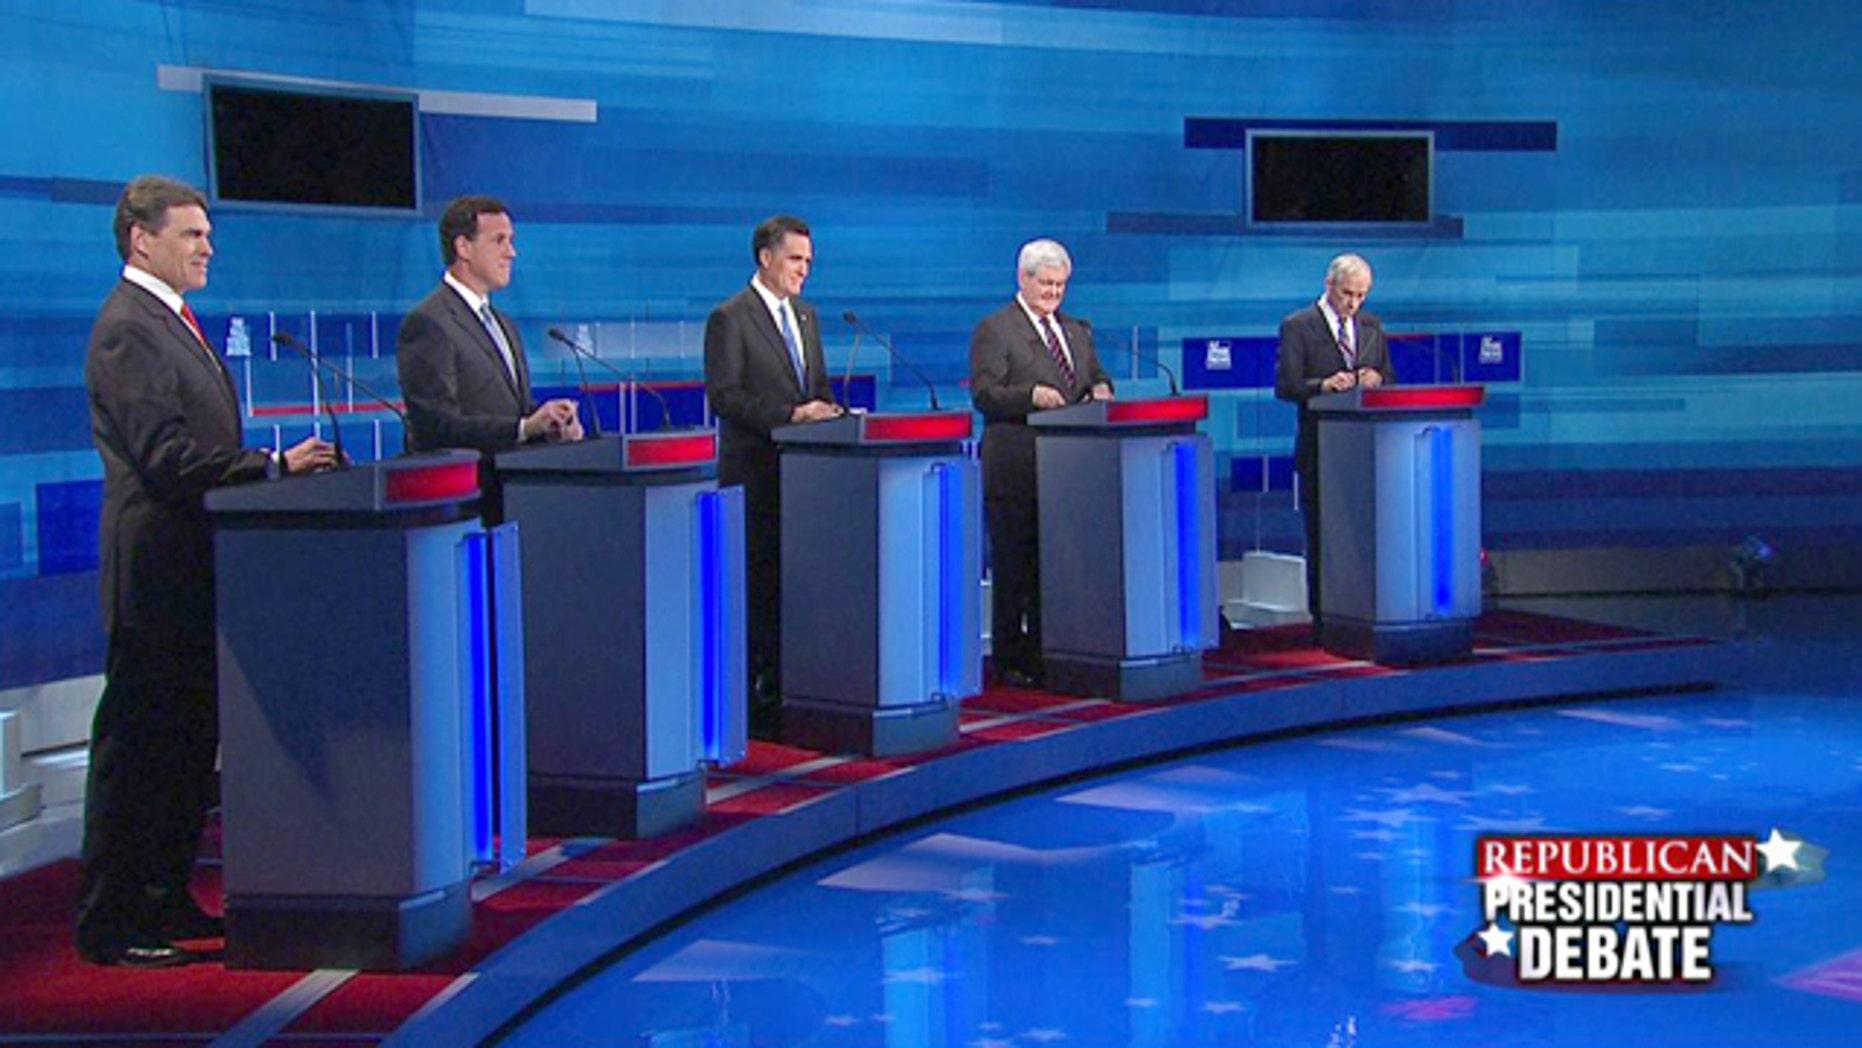 Jan. 16, 2012: Rick Perry, Rick Santorum, Mitt Romney, Newt Gingrich and Ron Paul square off in the Fox News/Wall Street Journal debate in Myrtle Beach, S.C.